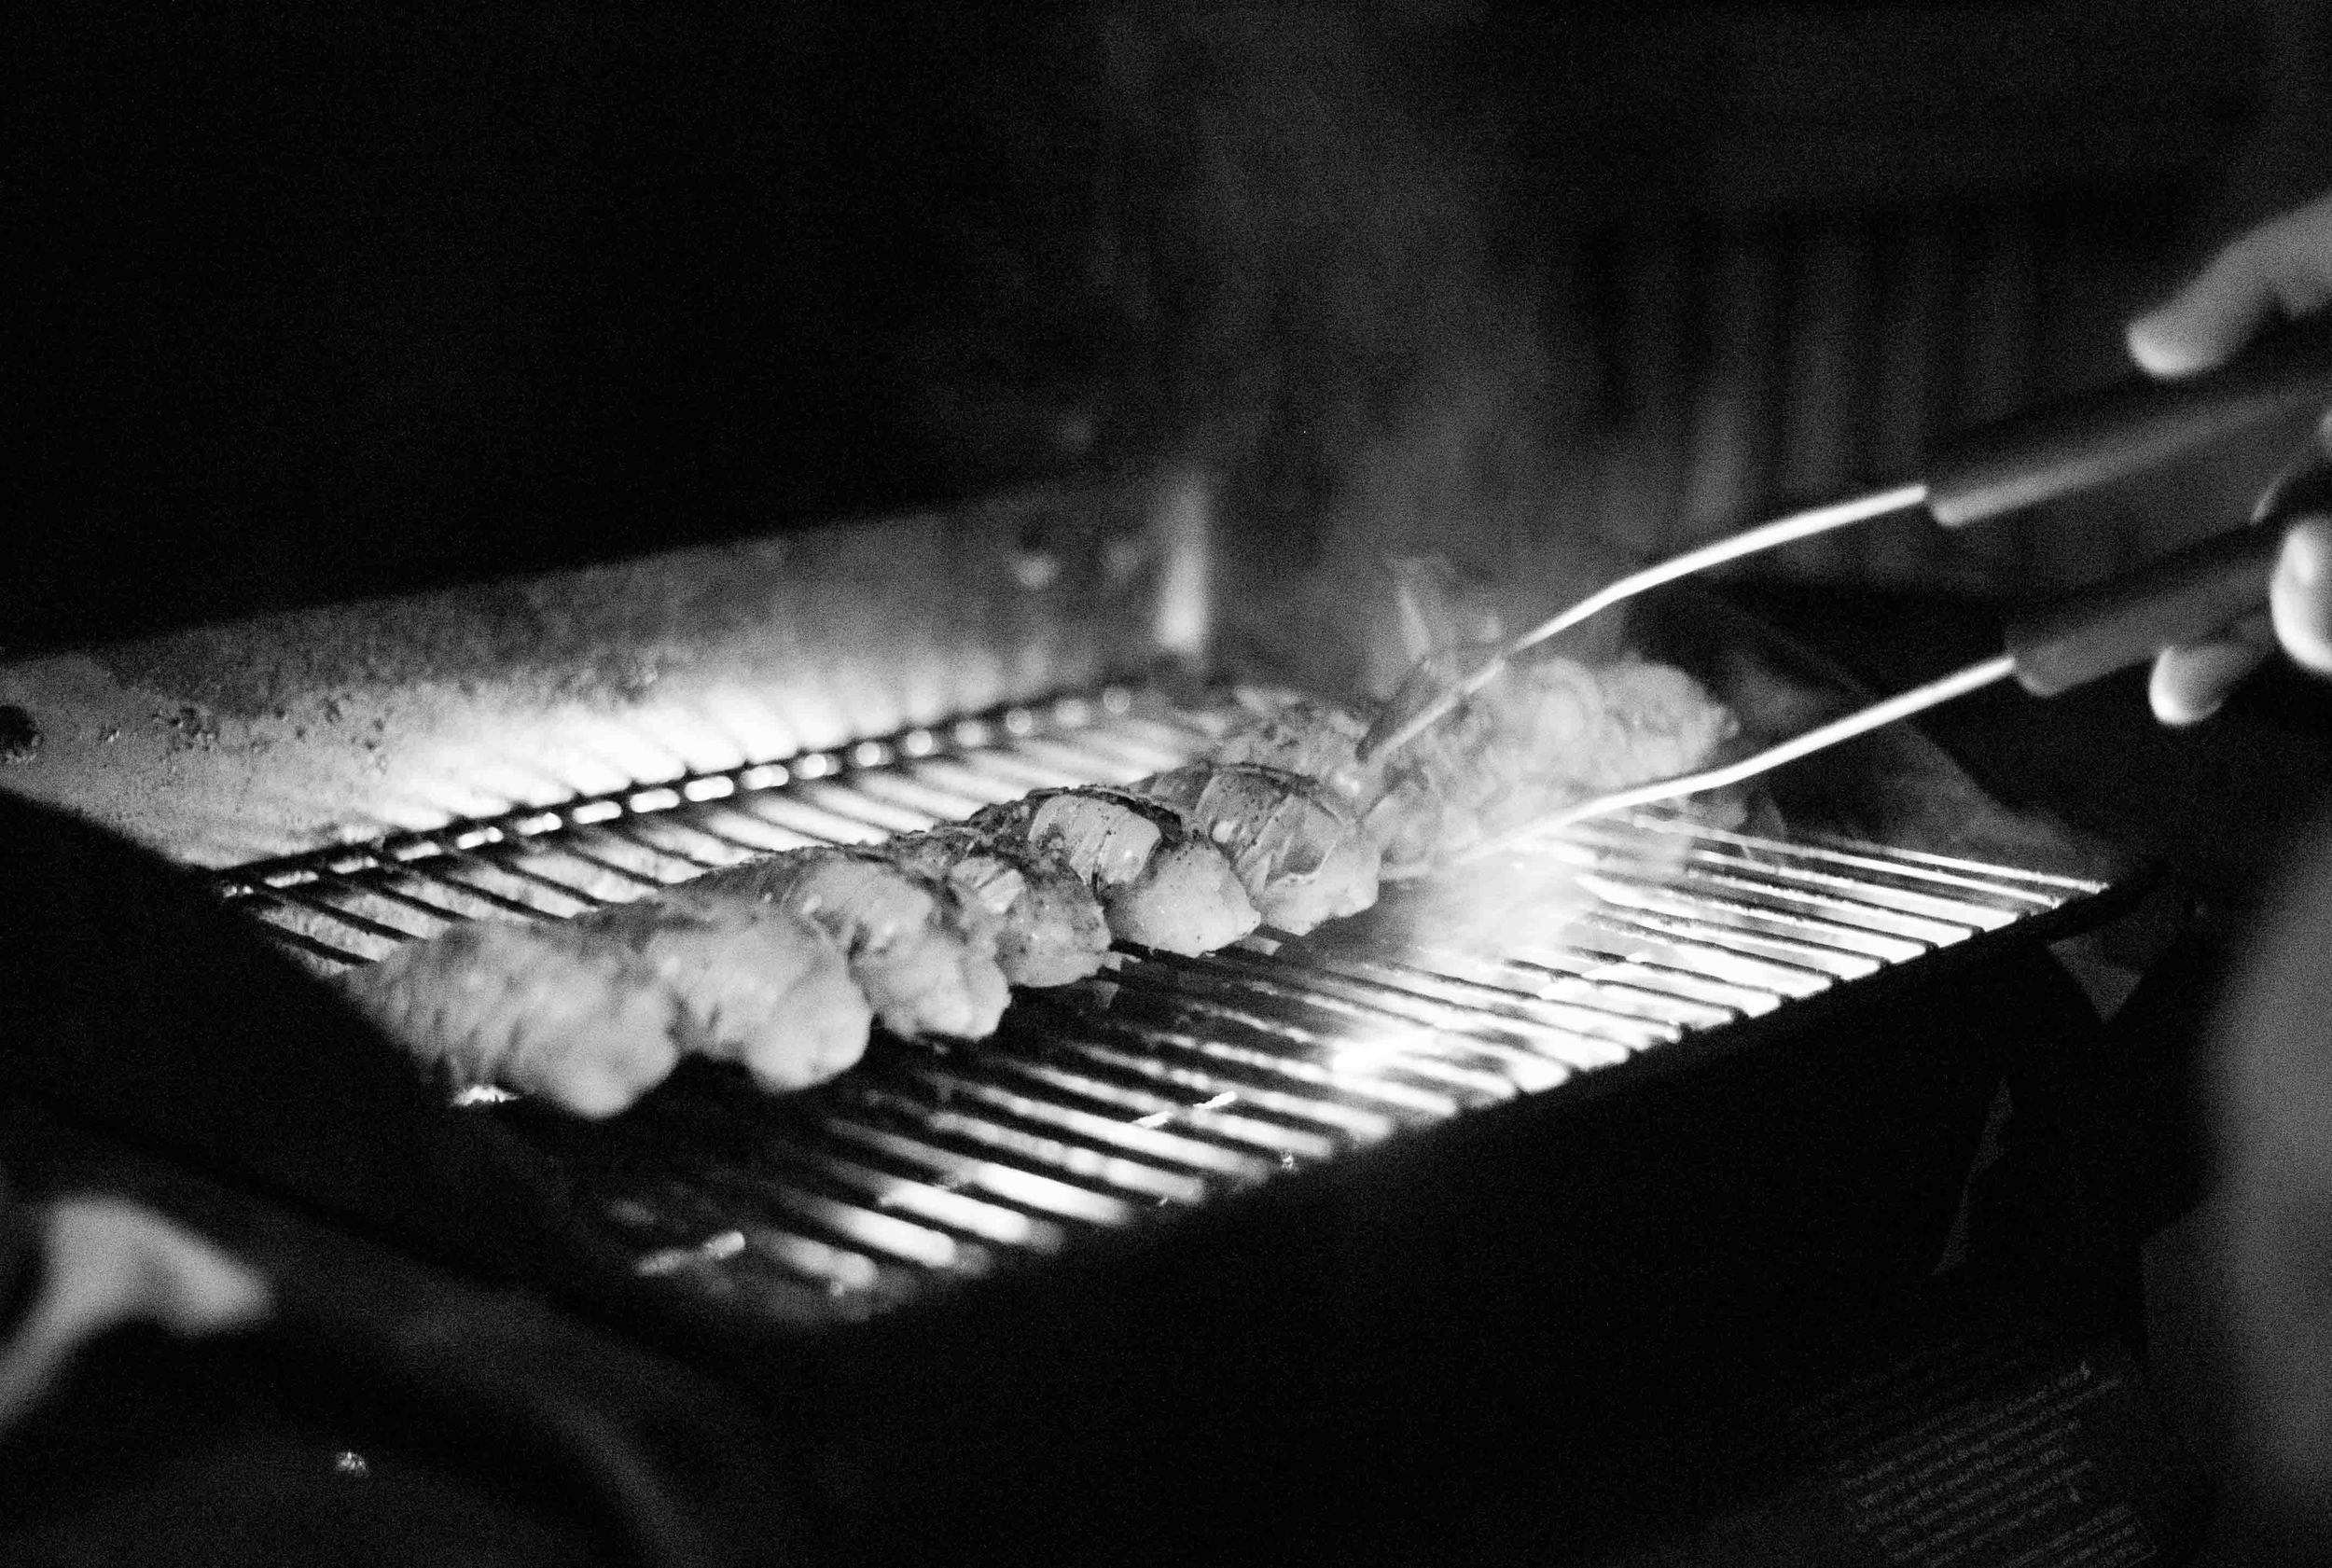 grilling fresh lobster